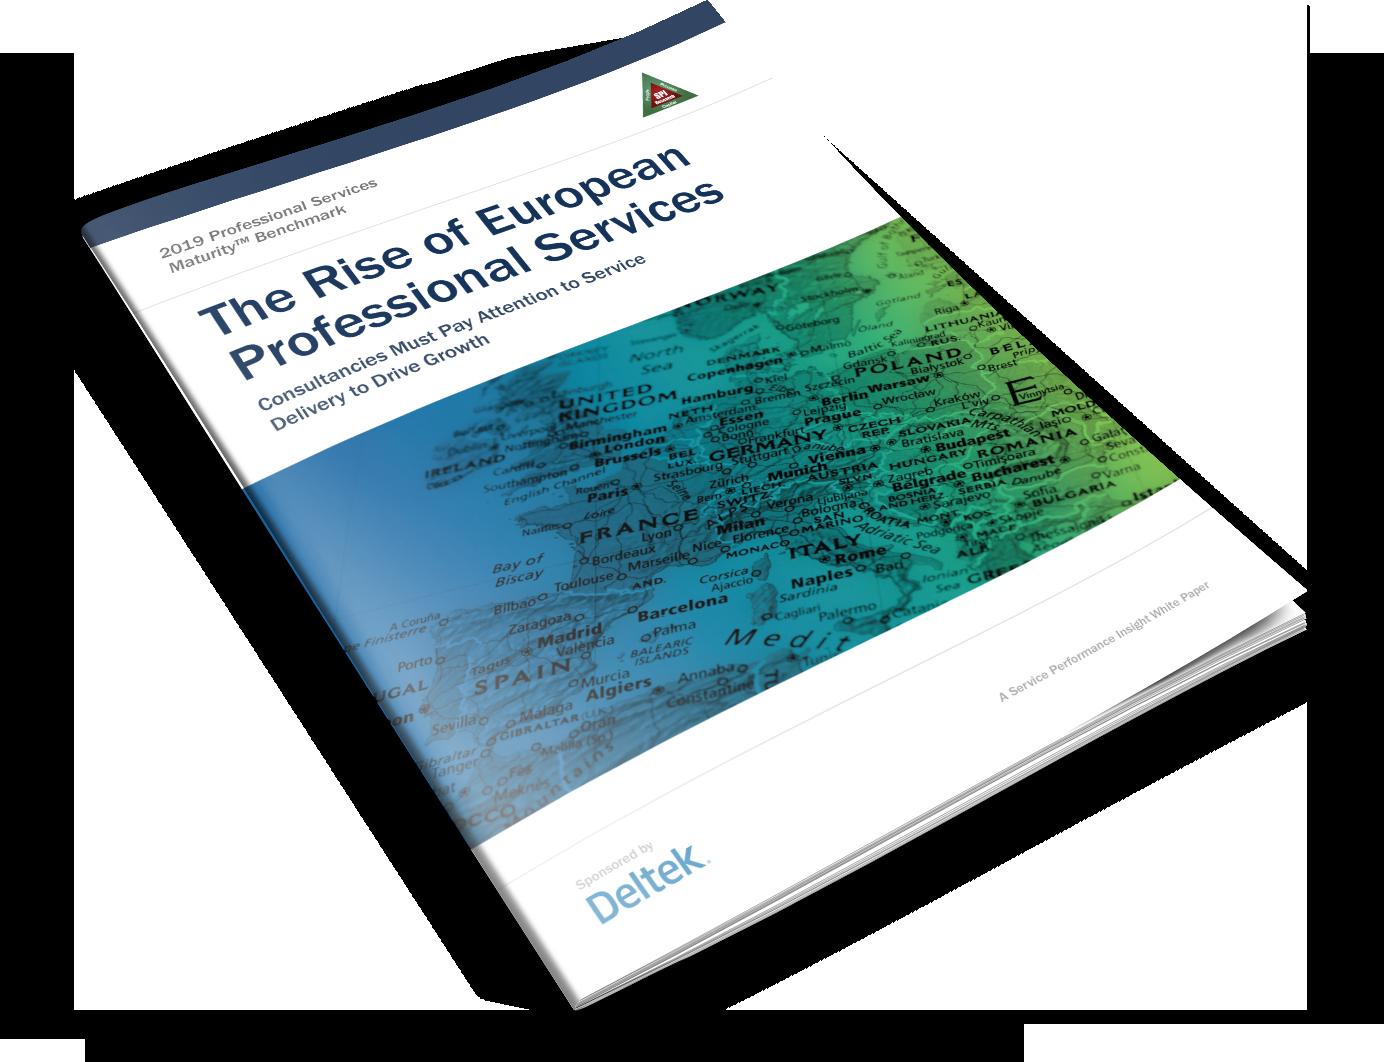 SPI Report - EMEA-Consulting